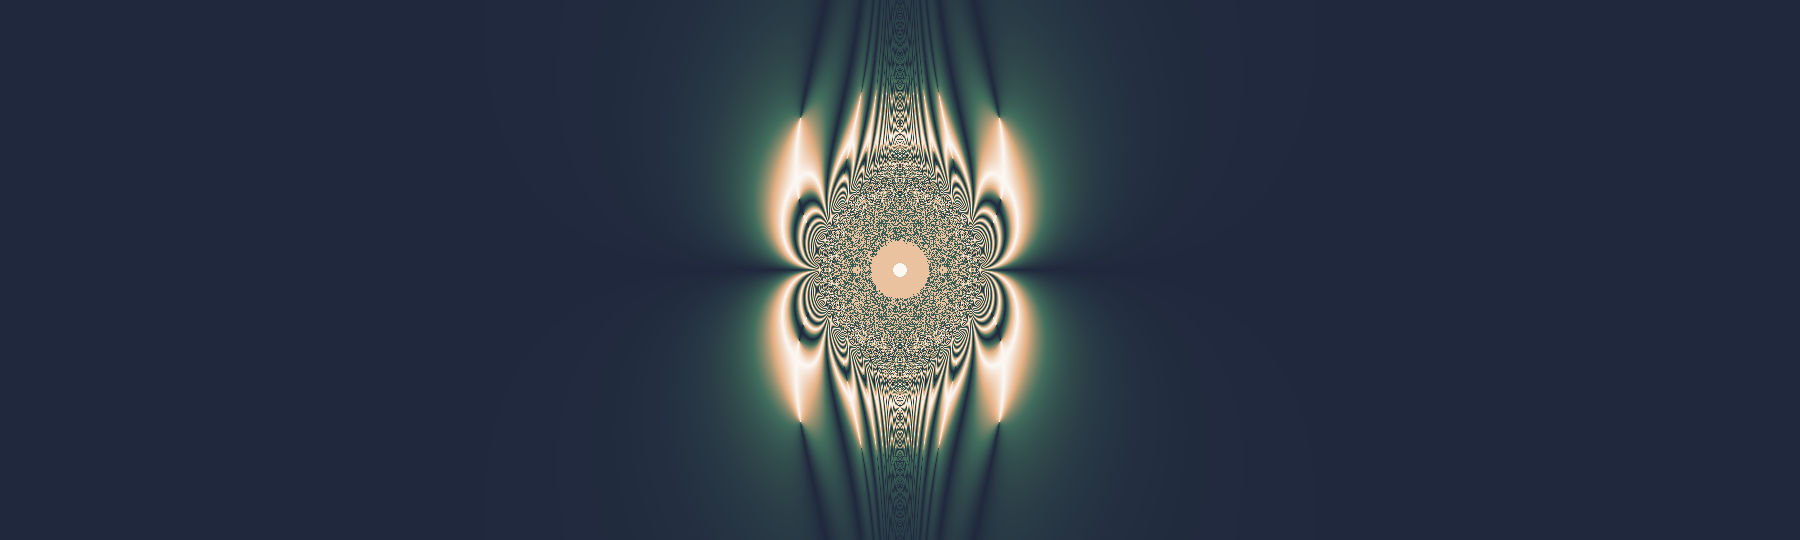 gfx-example-domain-coloring